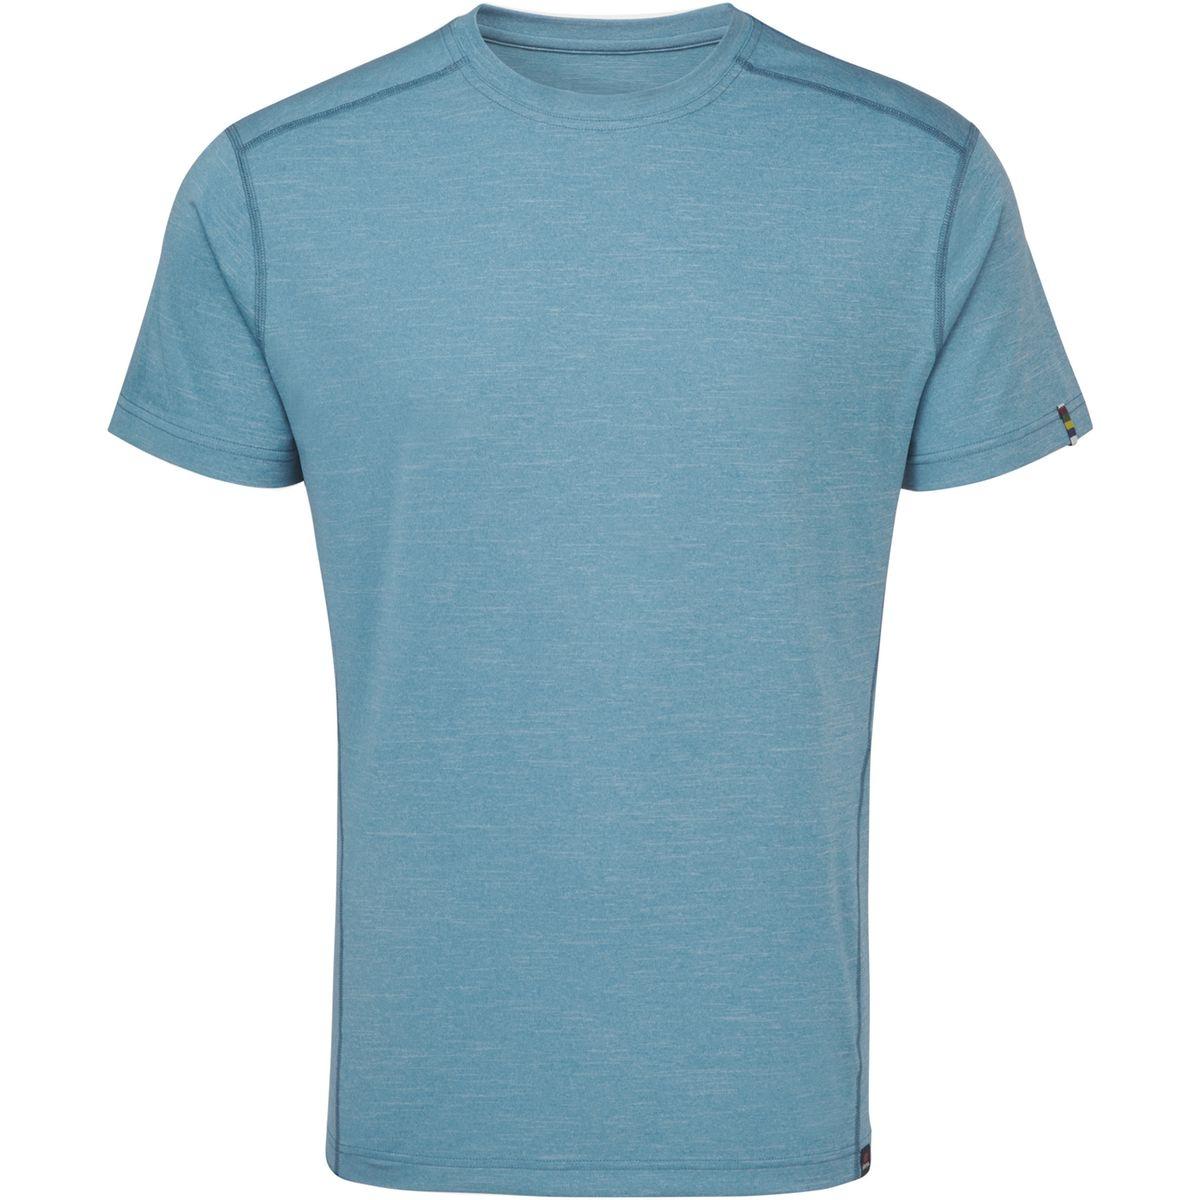 Rinchen - T-shirt manches courtes Homme - bleu